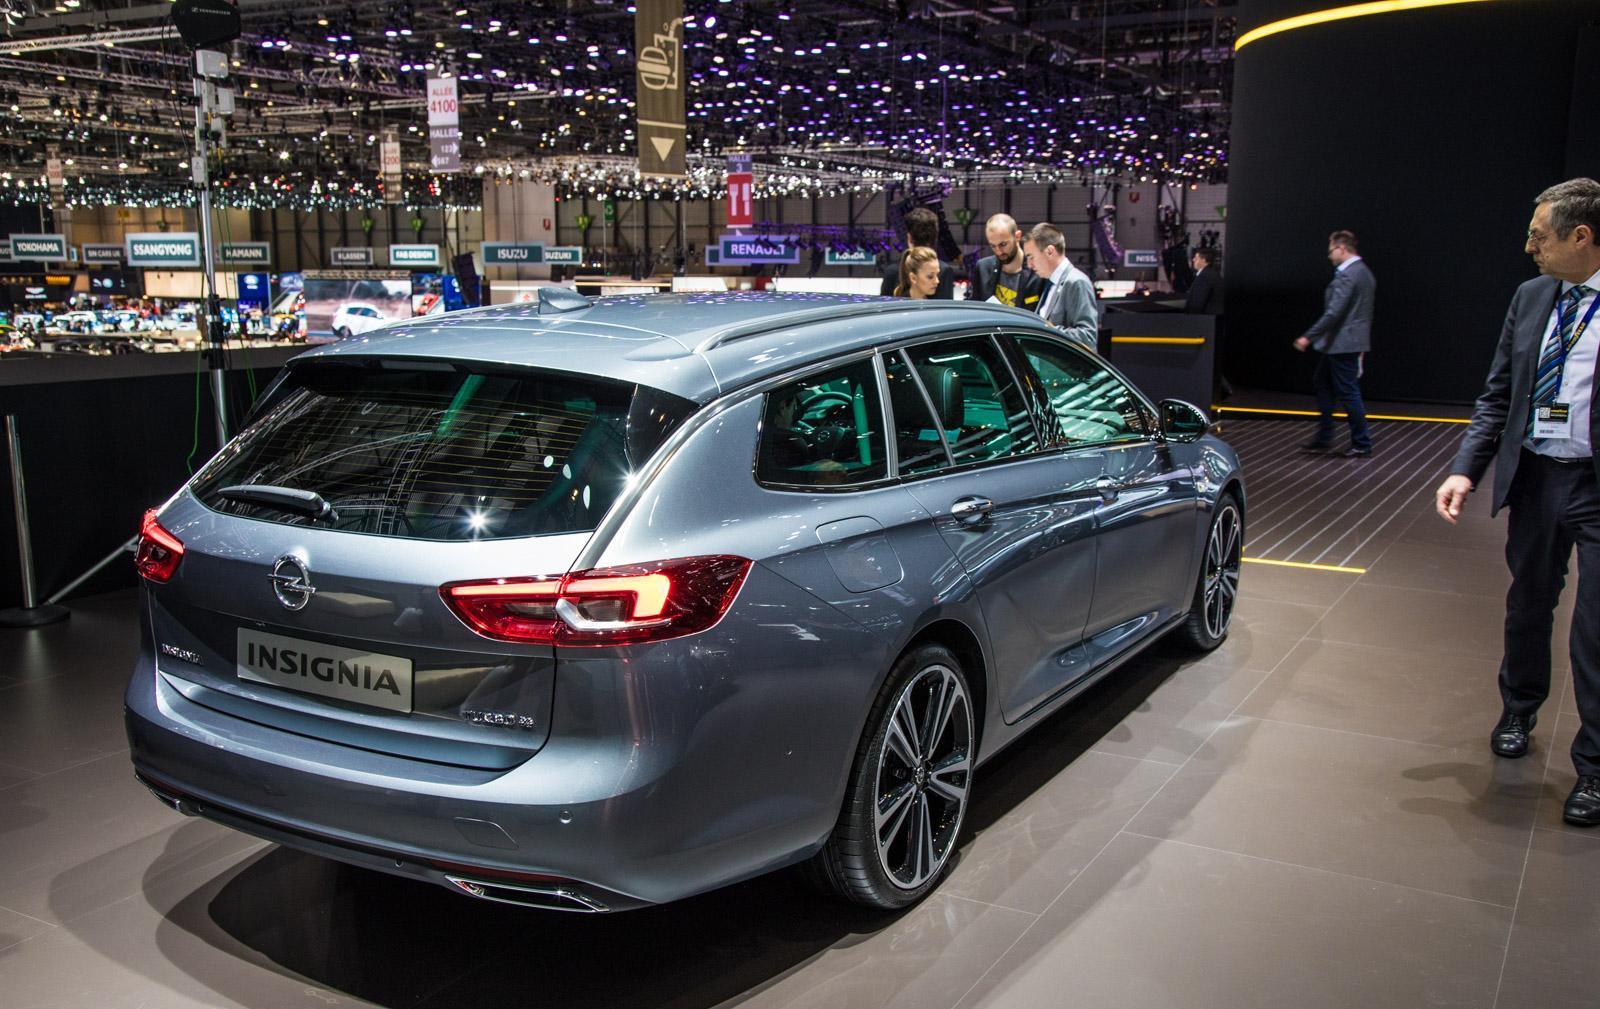 Opel-insignia-003